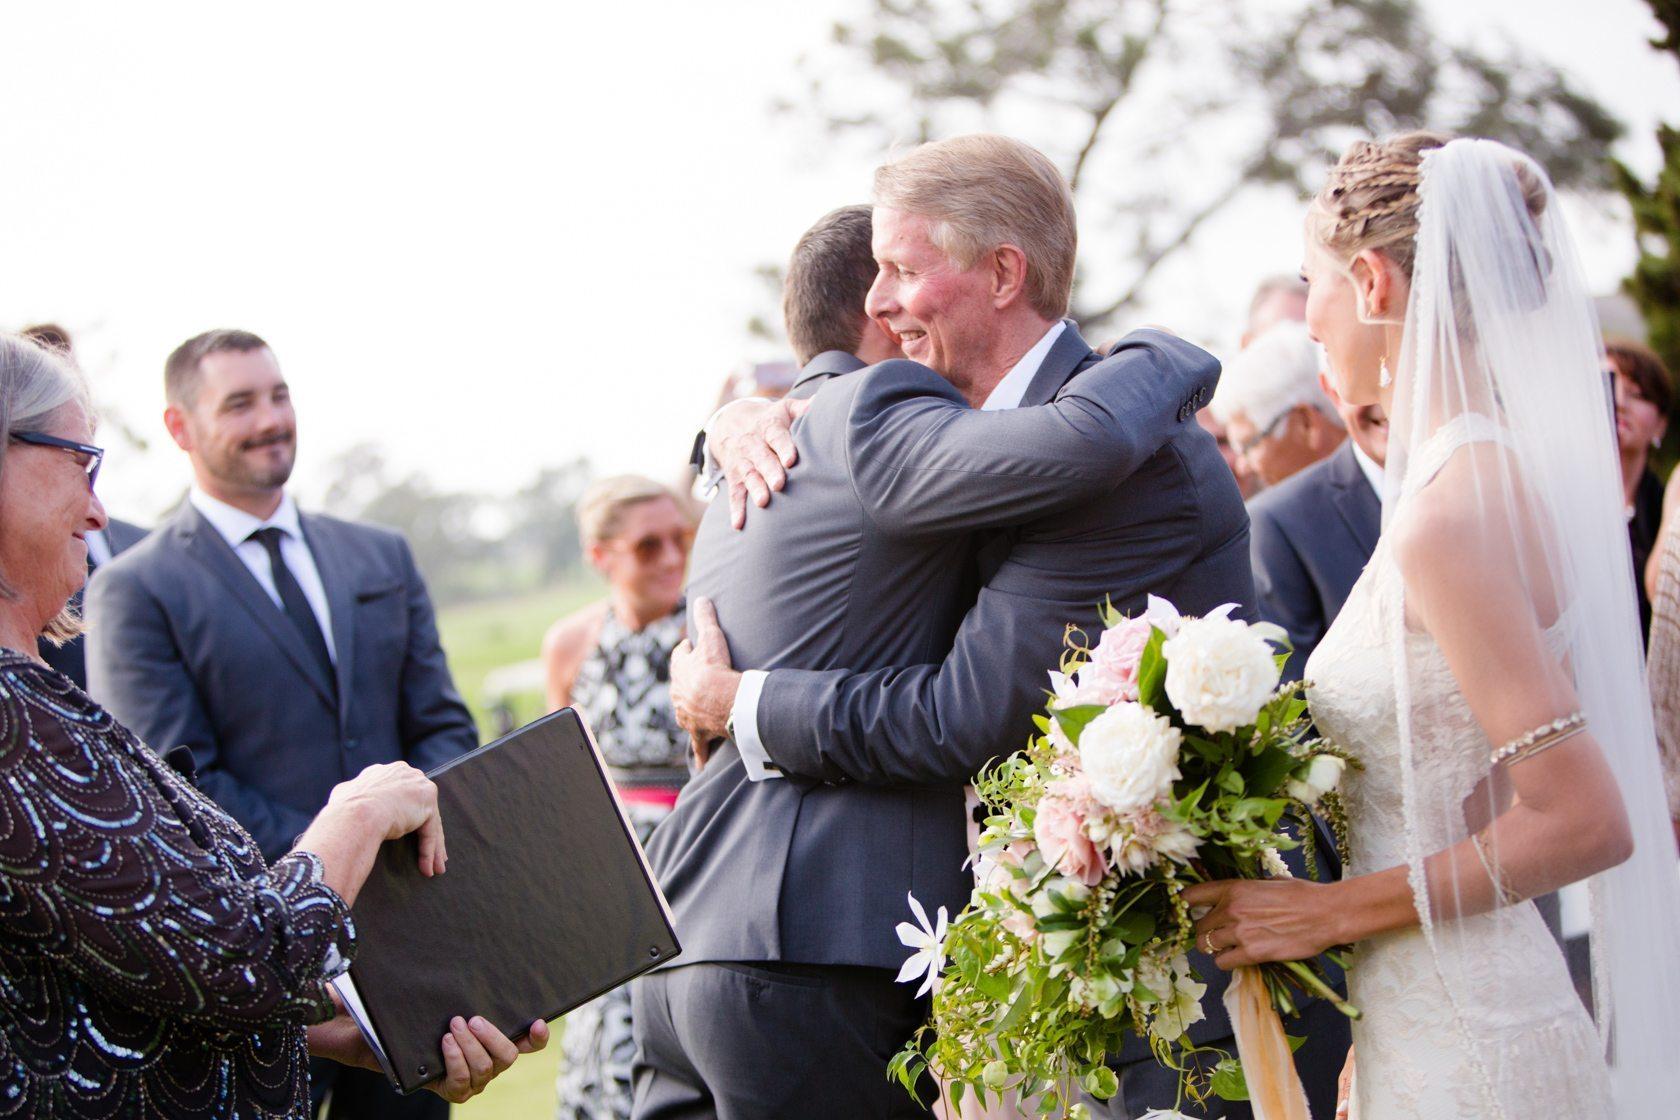 The_Lodge_at_Torrey_Pines_Wedding_047.jpg